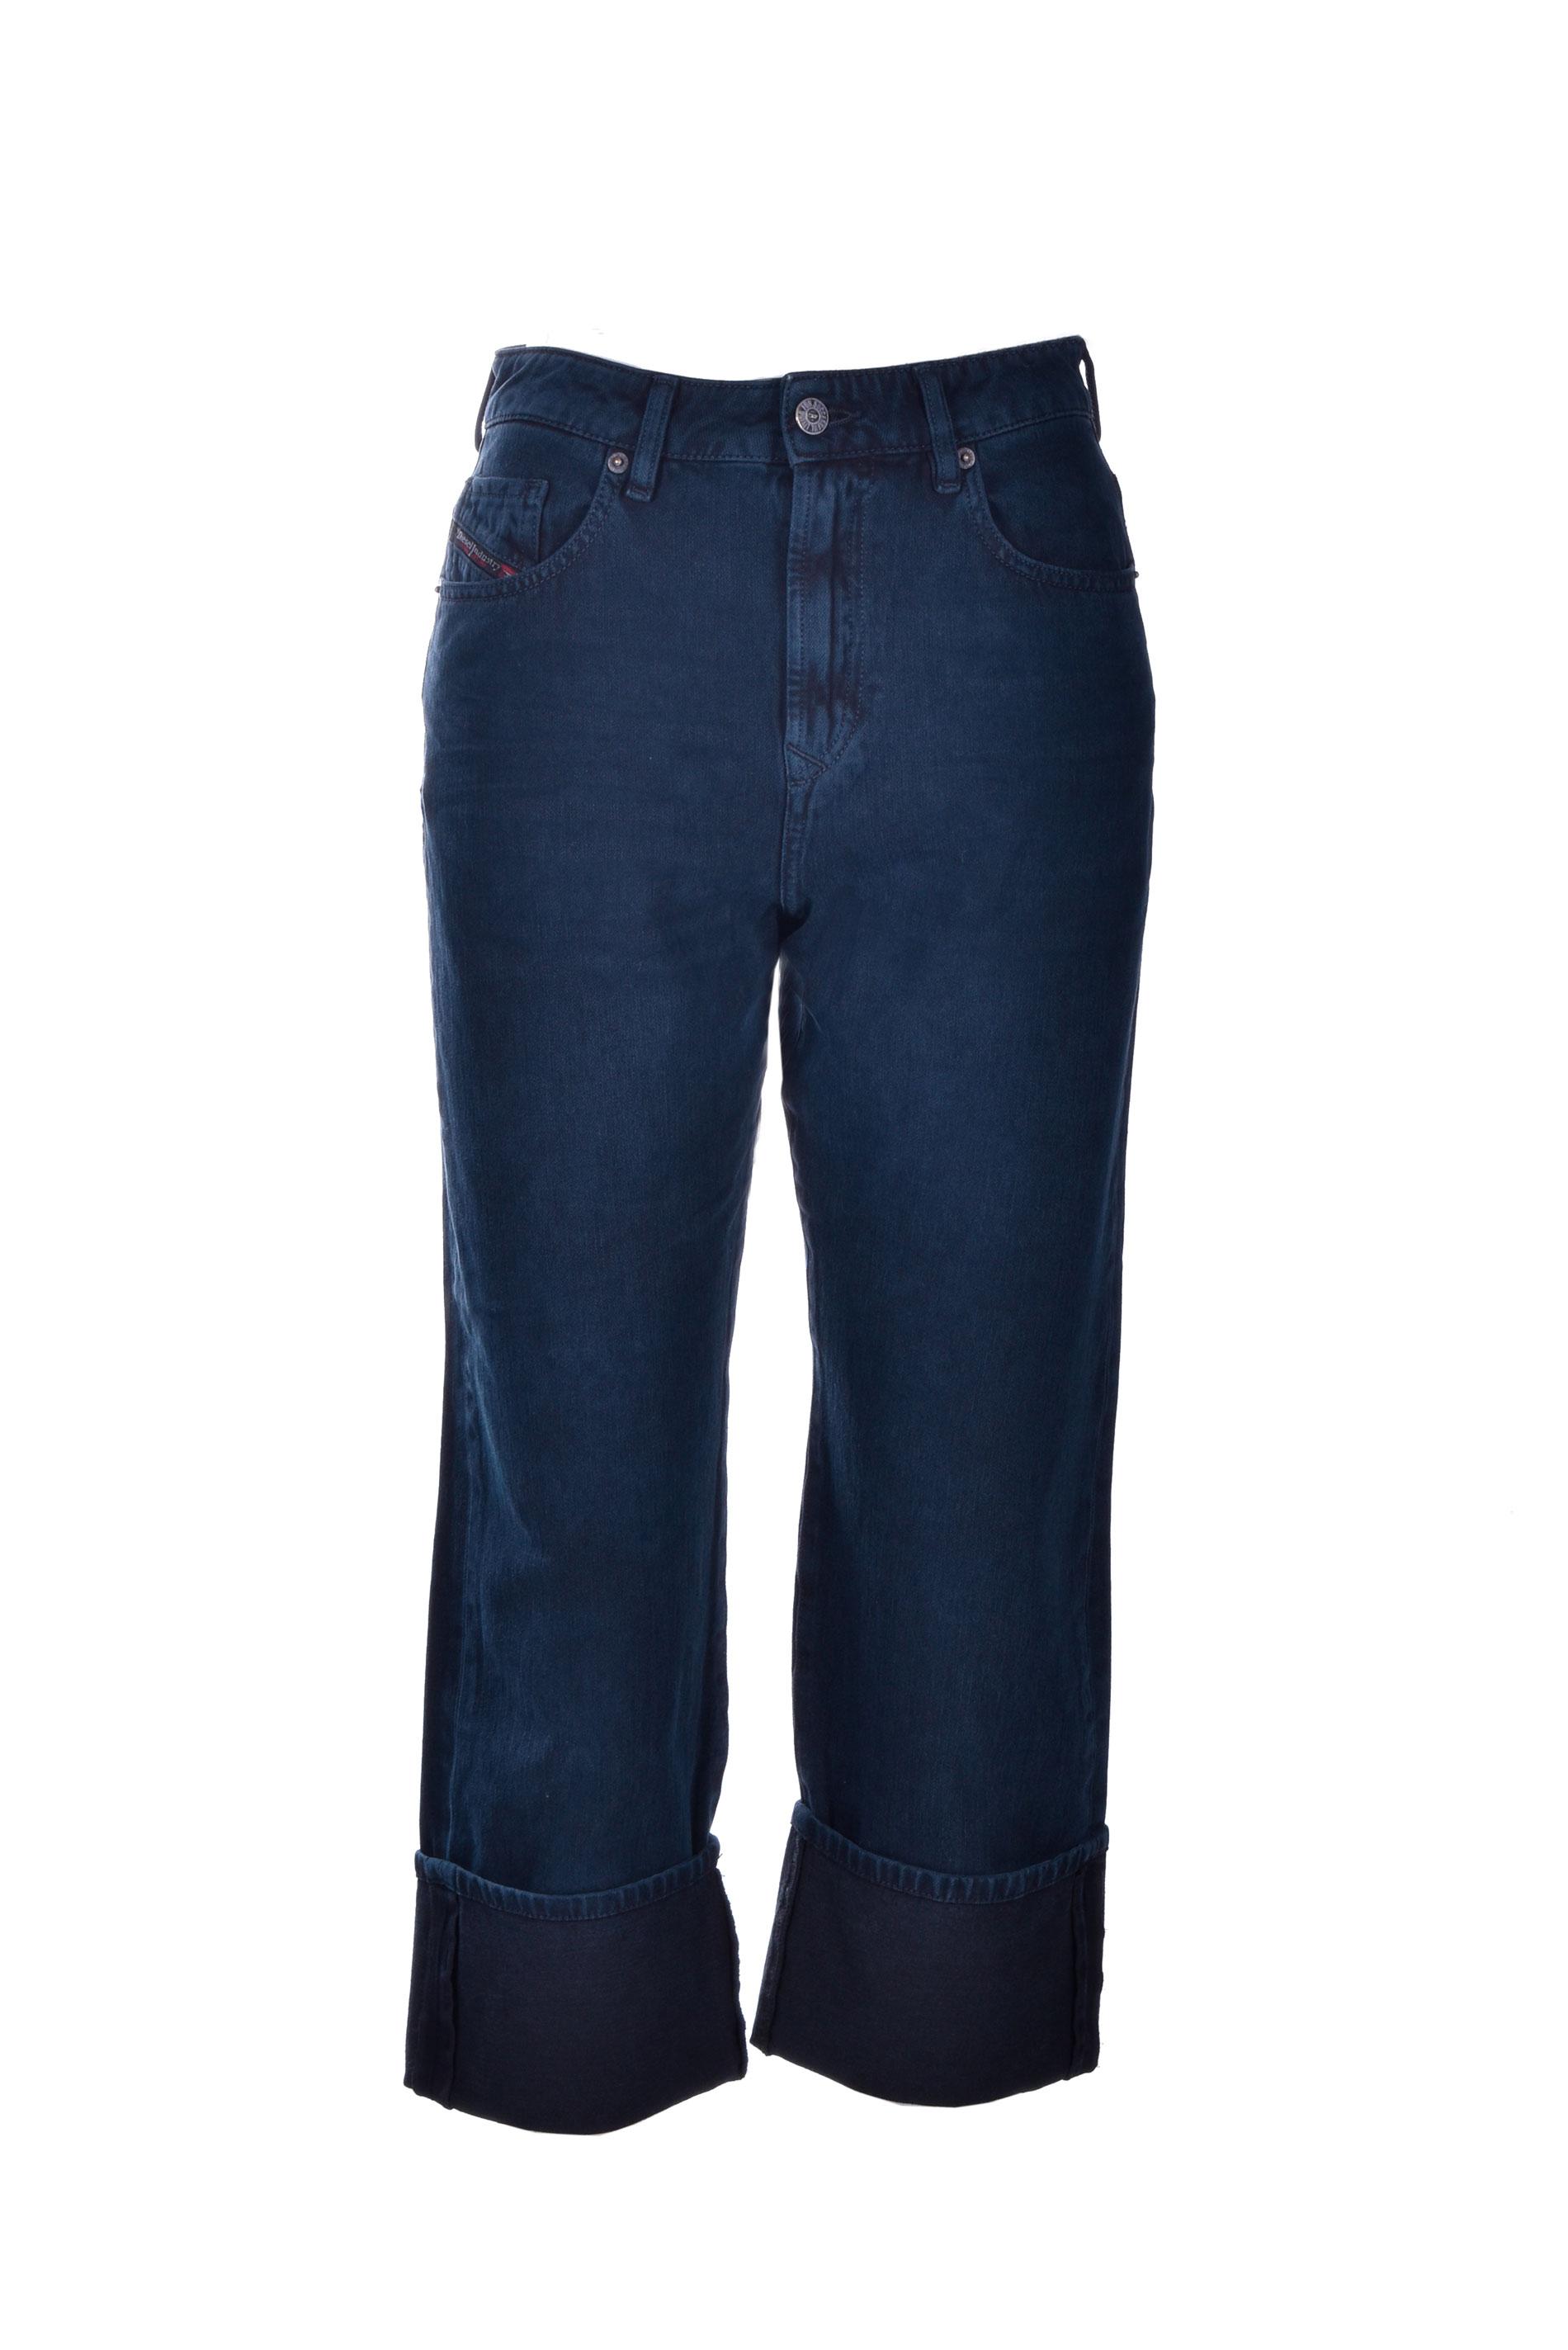 D-Reggy midnight blue jeans DIESEL | Jeans | 00S6FZ 009IP01